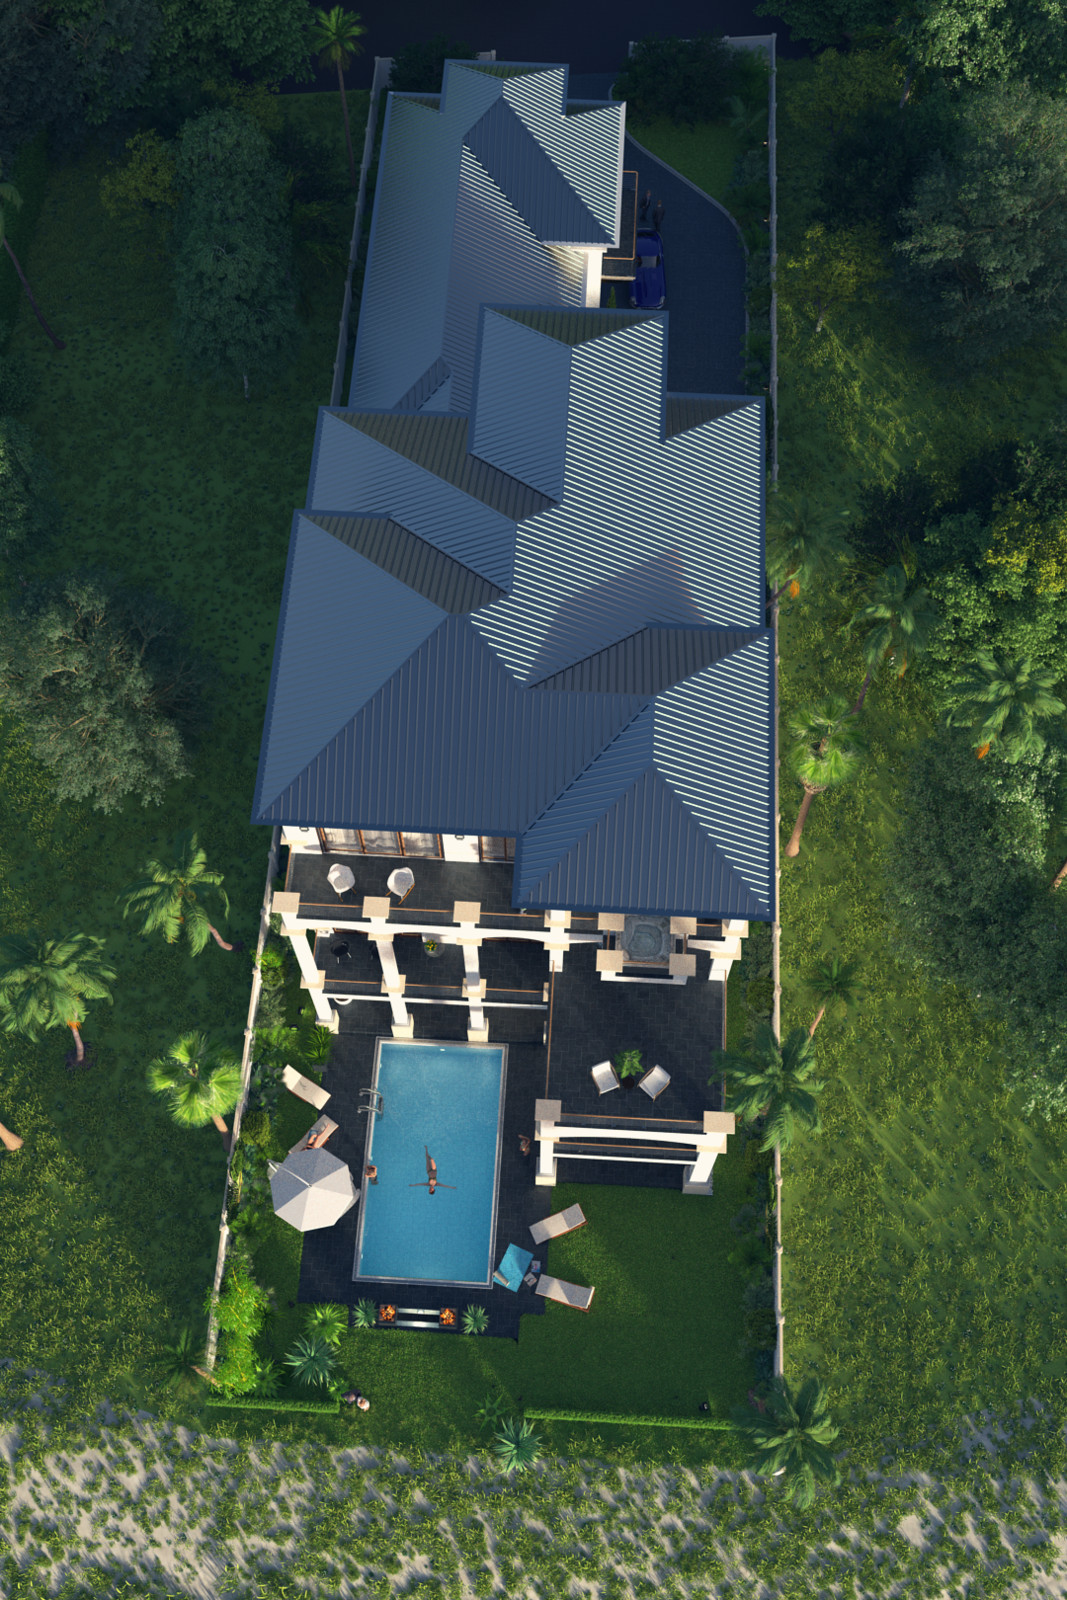 SketchUp + Thea Render  Seagrove Beach House: Scene 21 Vertical 5-3 Nash 1080 × 1620 Presto MC Bucket